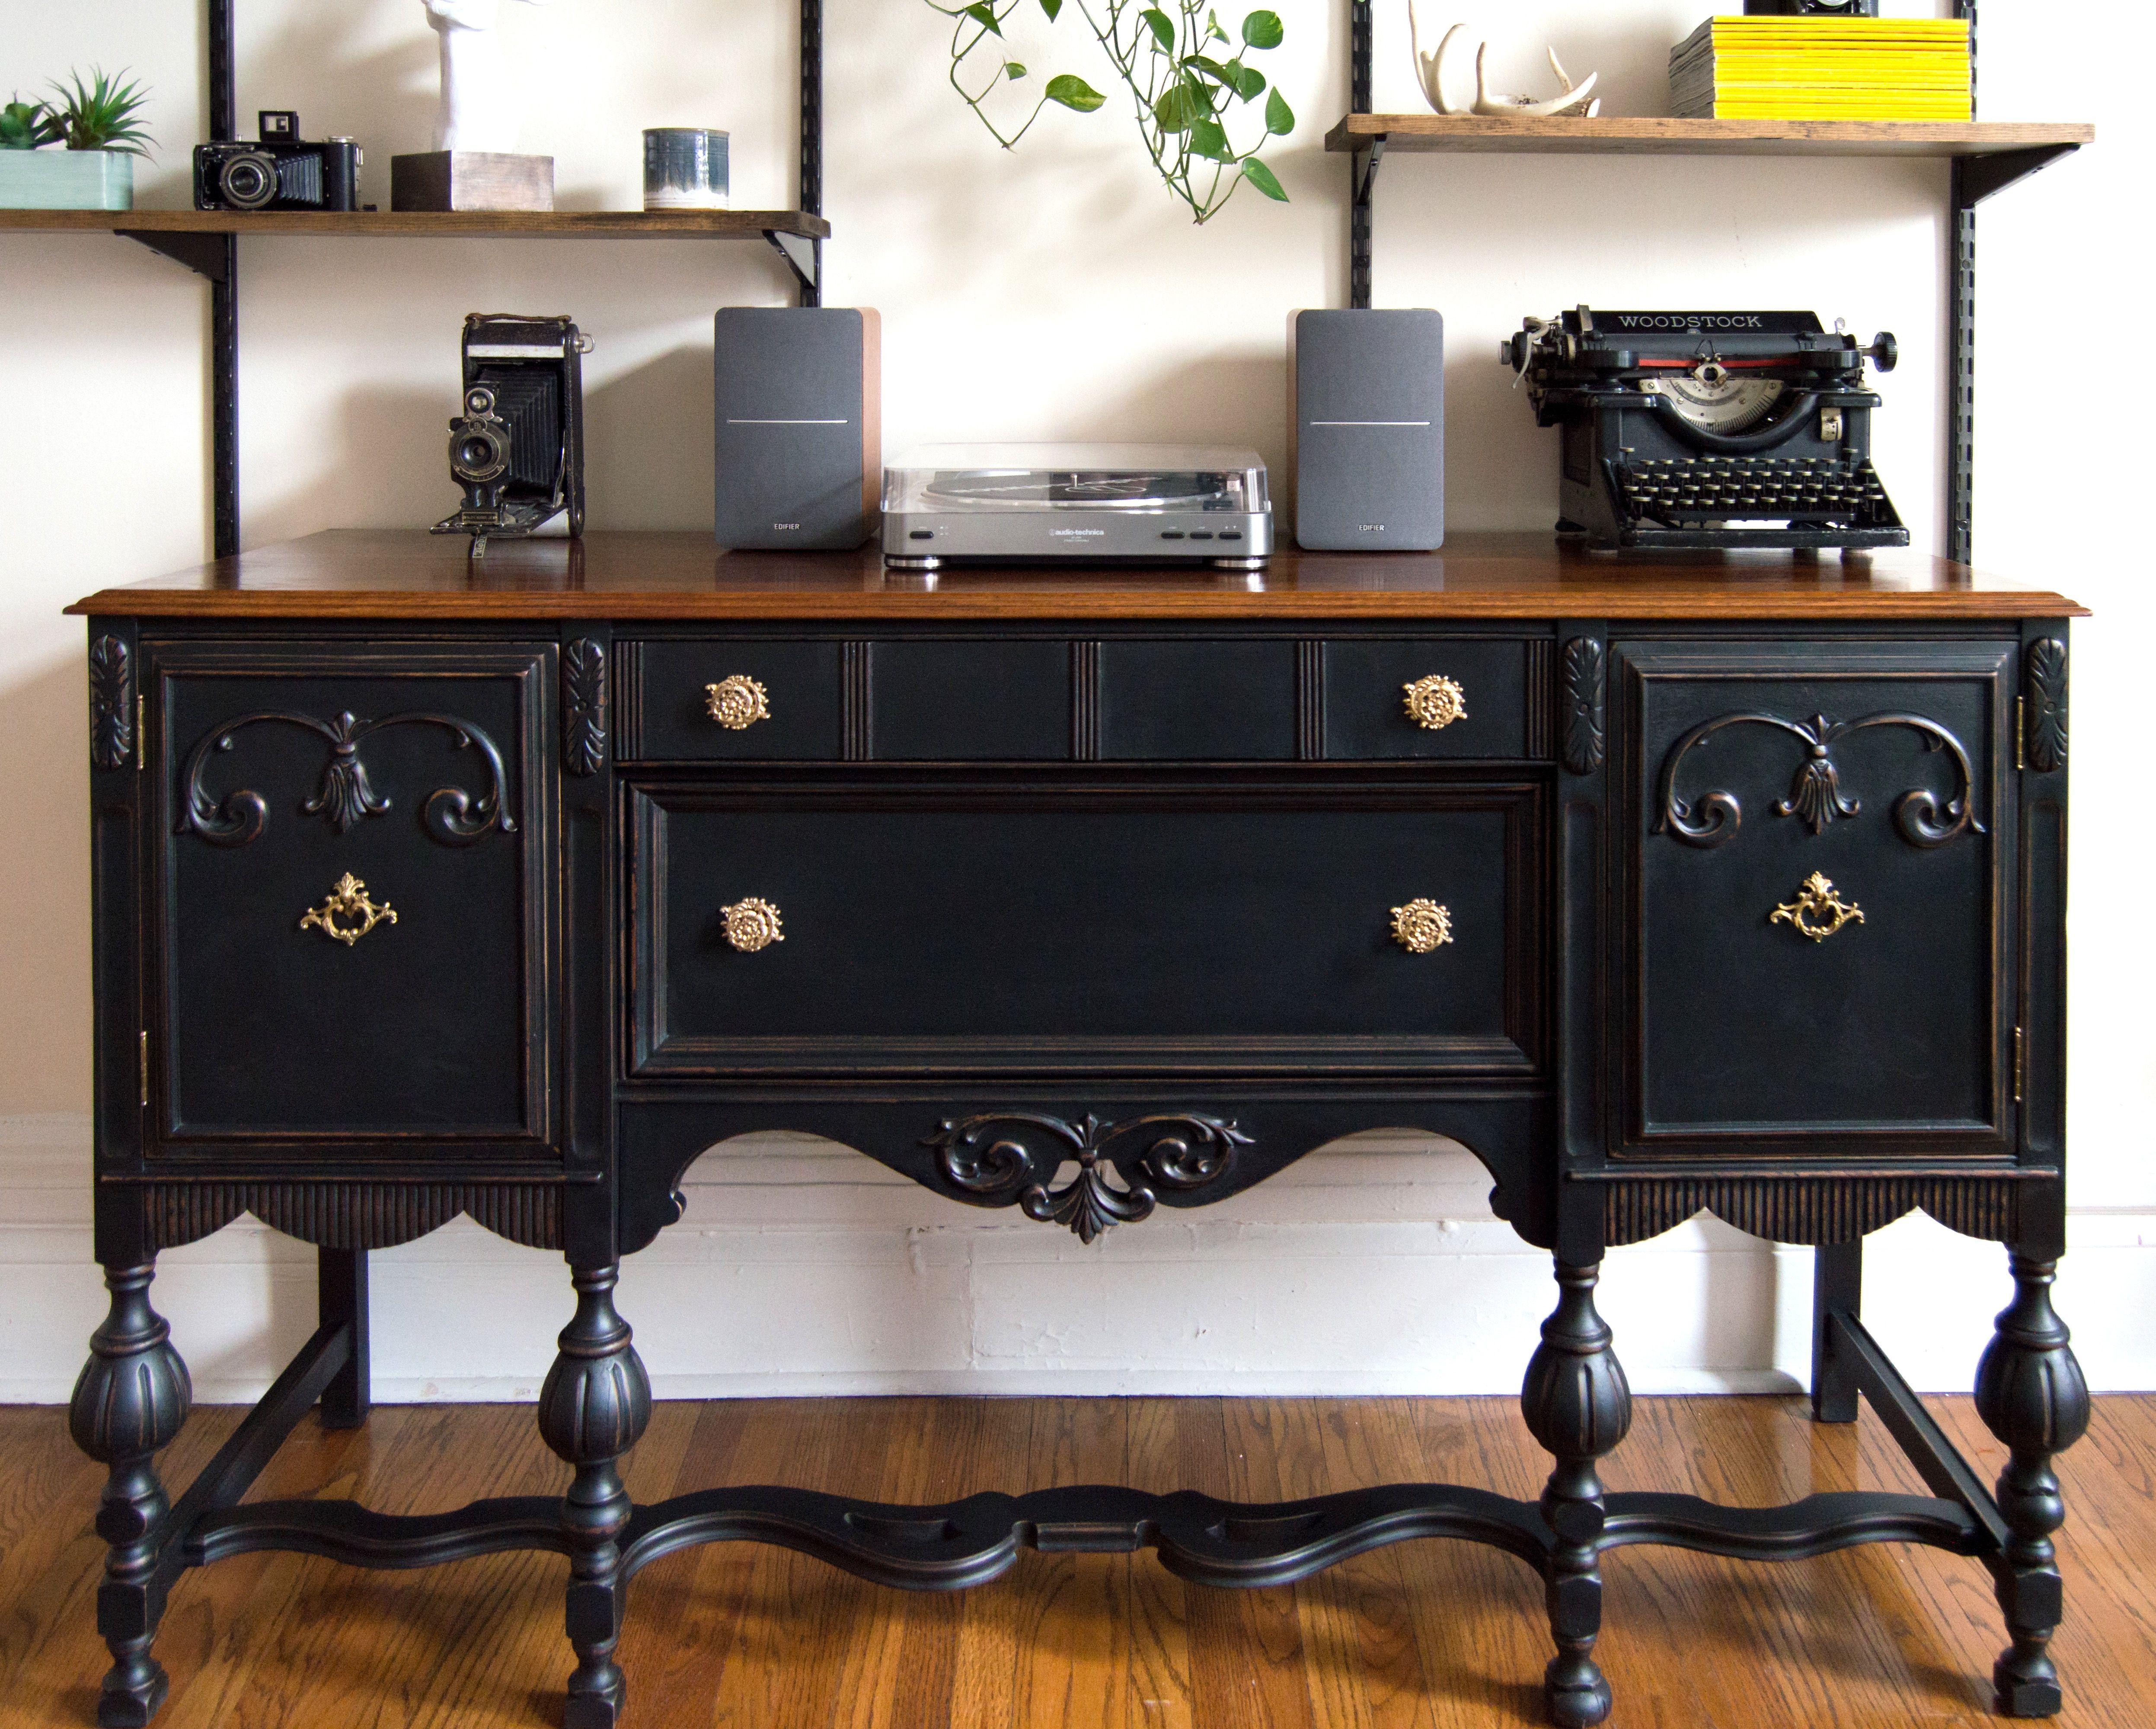 Antique Buffet Restoration Using Black Chalk Paint Antiquing Furniture Diy Furniture Diy Furniture Makeover